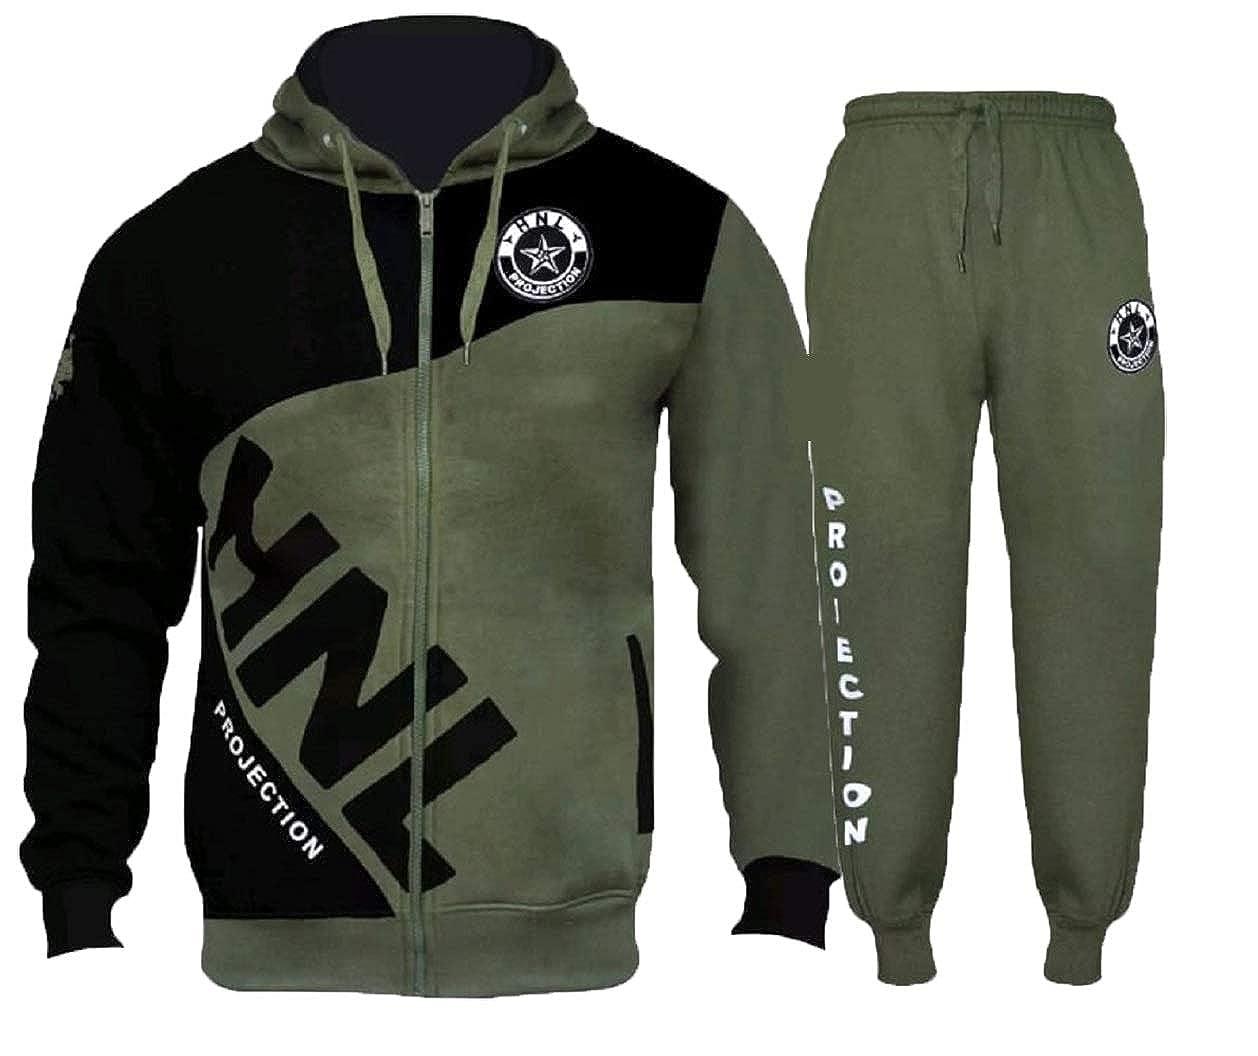 FLIRTY WARDROBE Mens HNL Tracksuit Joggers Hoodie Sweatshirt Pants Sweats Bottoms Plus Size UK